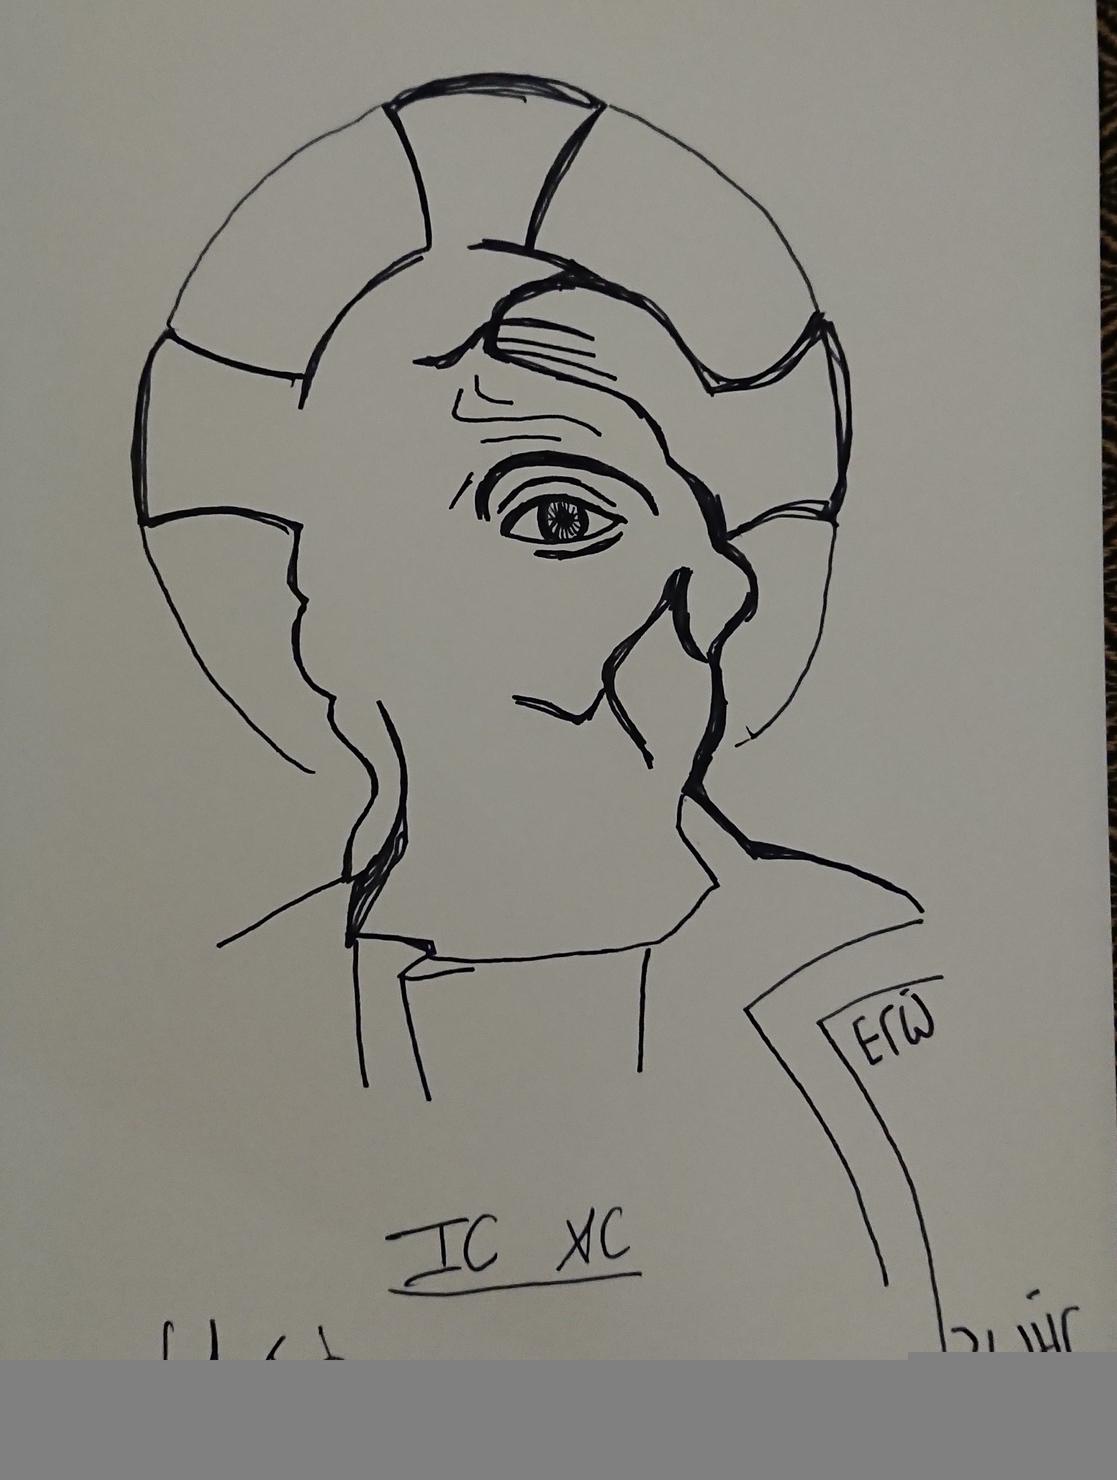 IC XC. (Dessin)